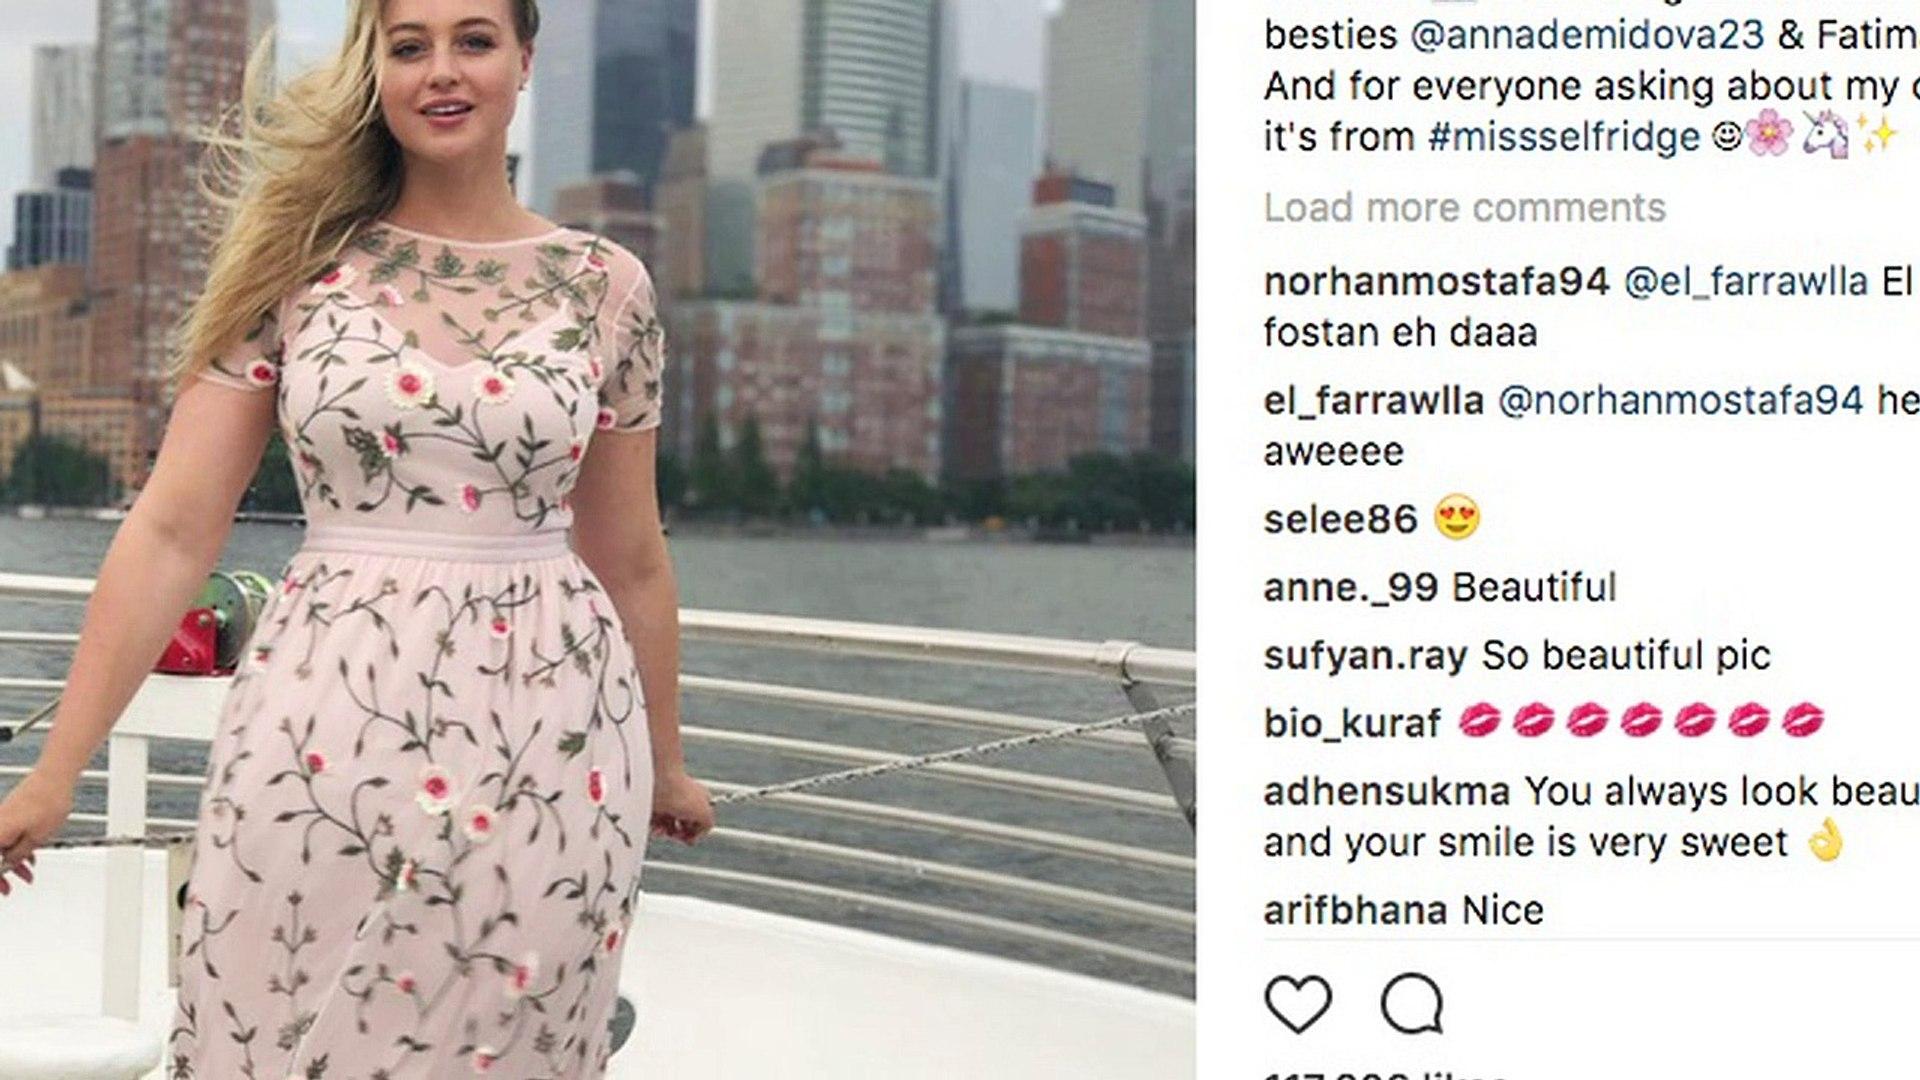 British fashion model waging war on unattainable beauty standard